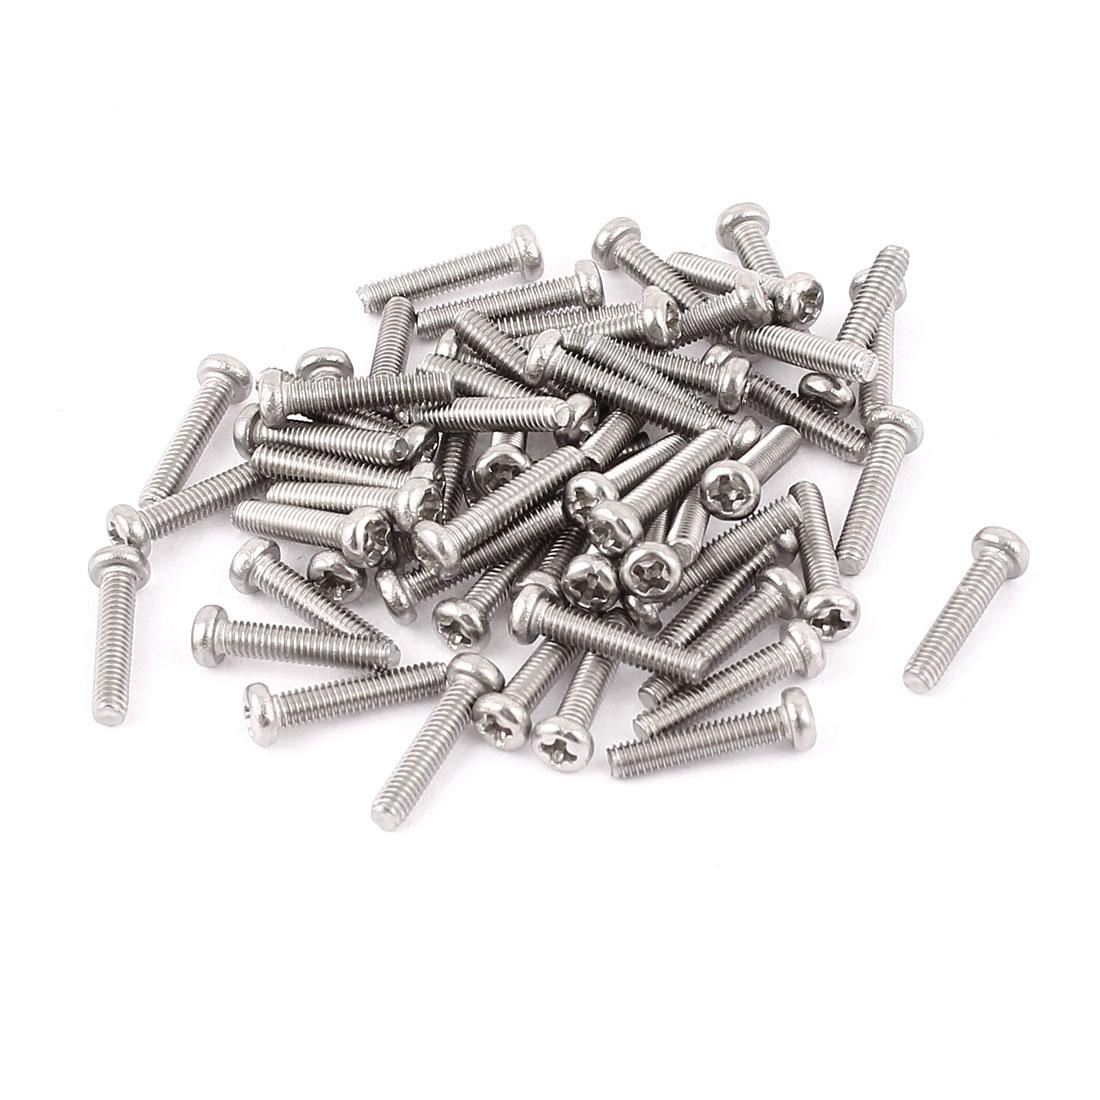 M2.5 x 12mm 304 Stainless Steel Crosshead Phillips Pan Head Screws Bolt 60pcs